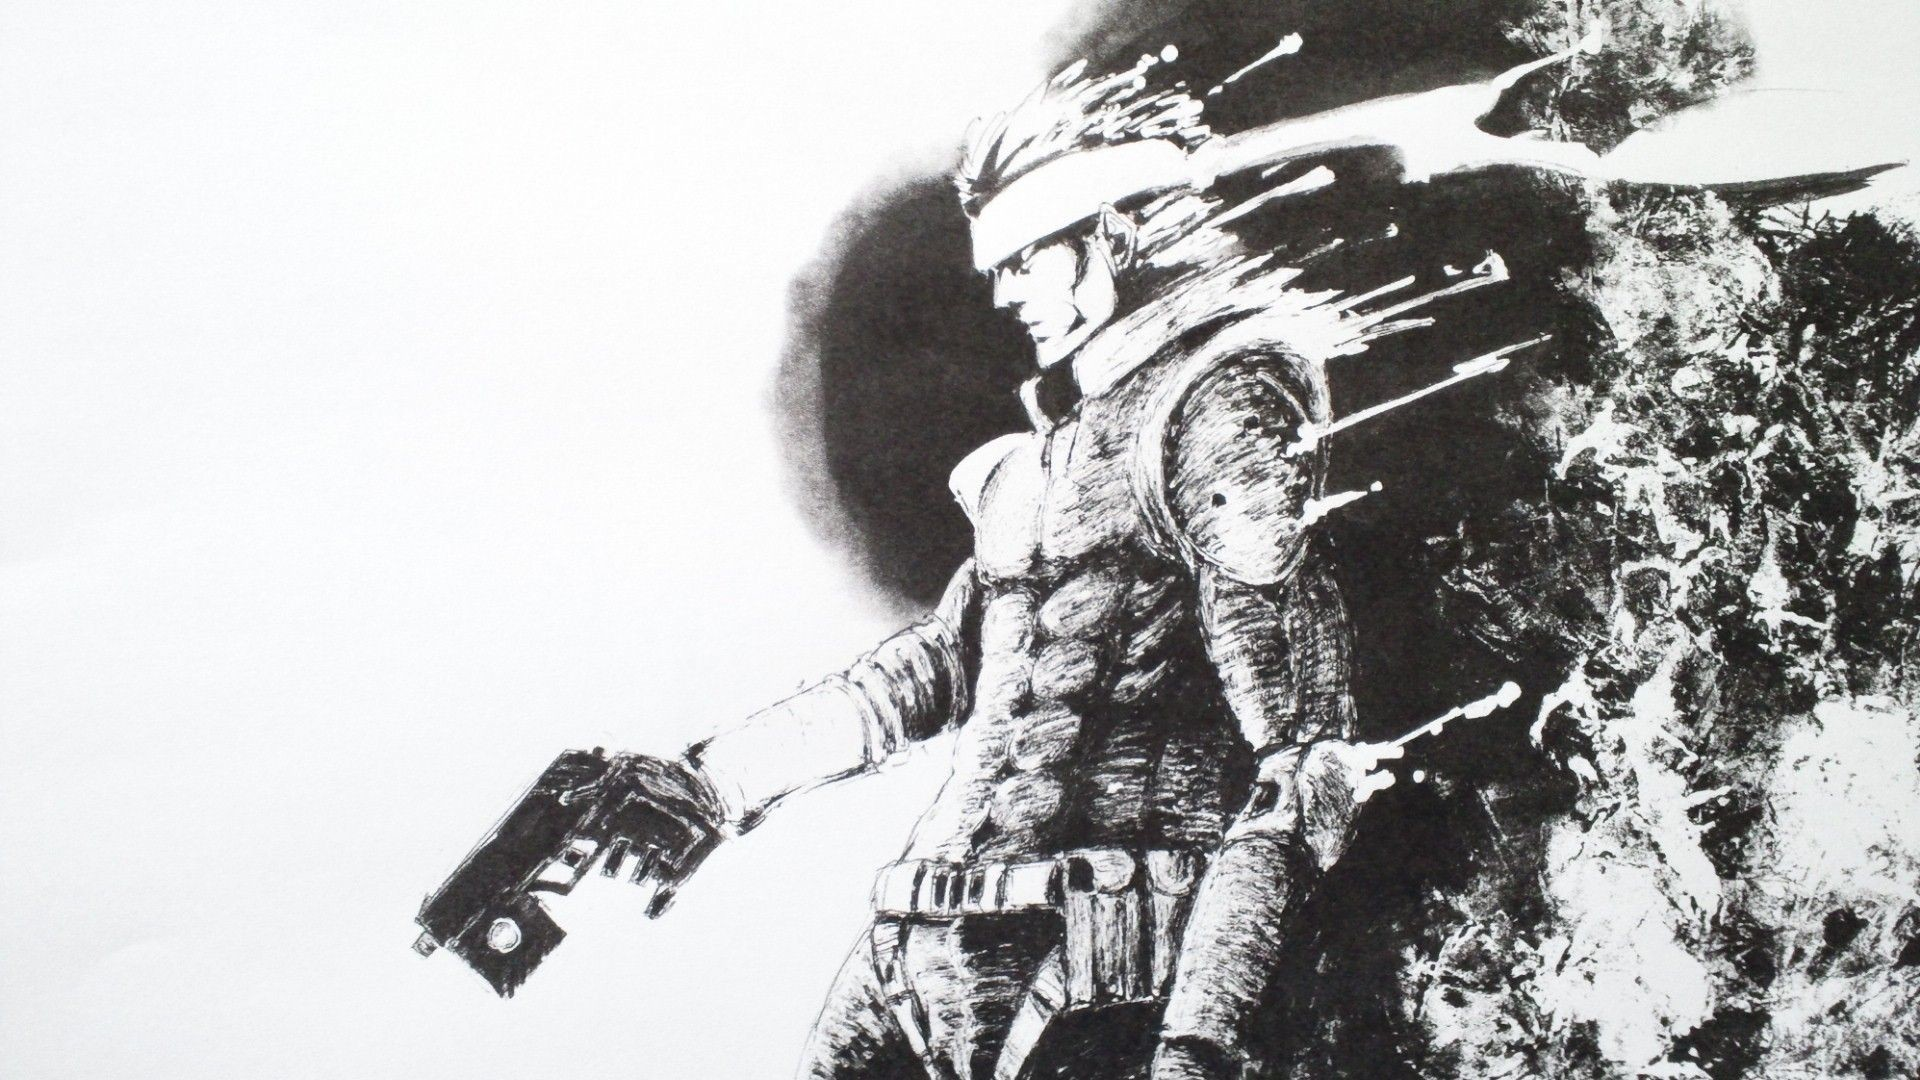 Metal Gear Solid Wallpapers HD – Wallpaper Cave